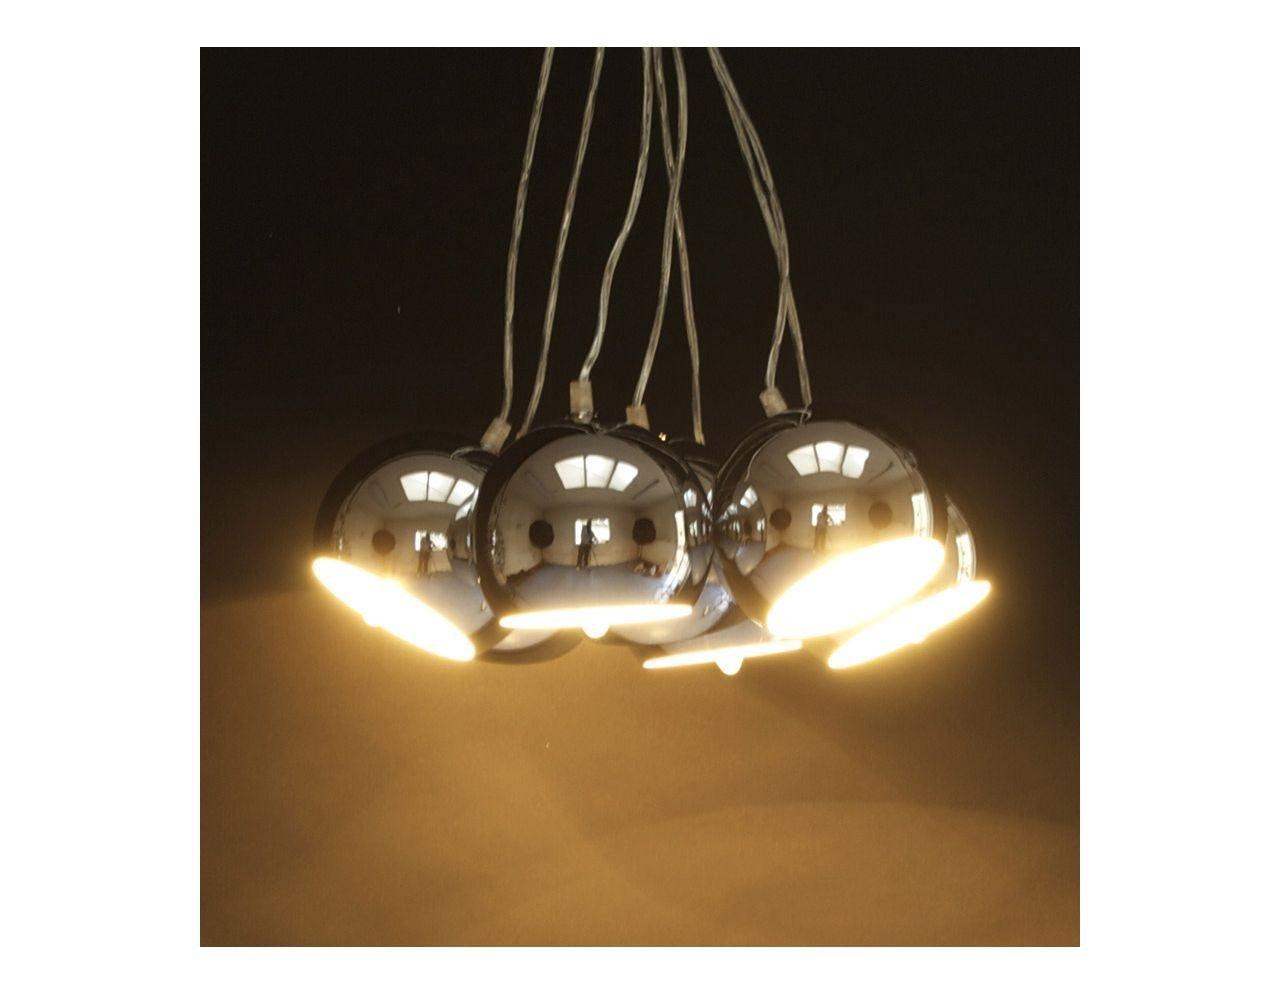 7 Lampenschirme aus Chromstahl-Kokoon Design